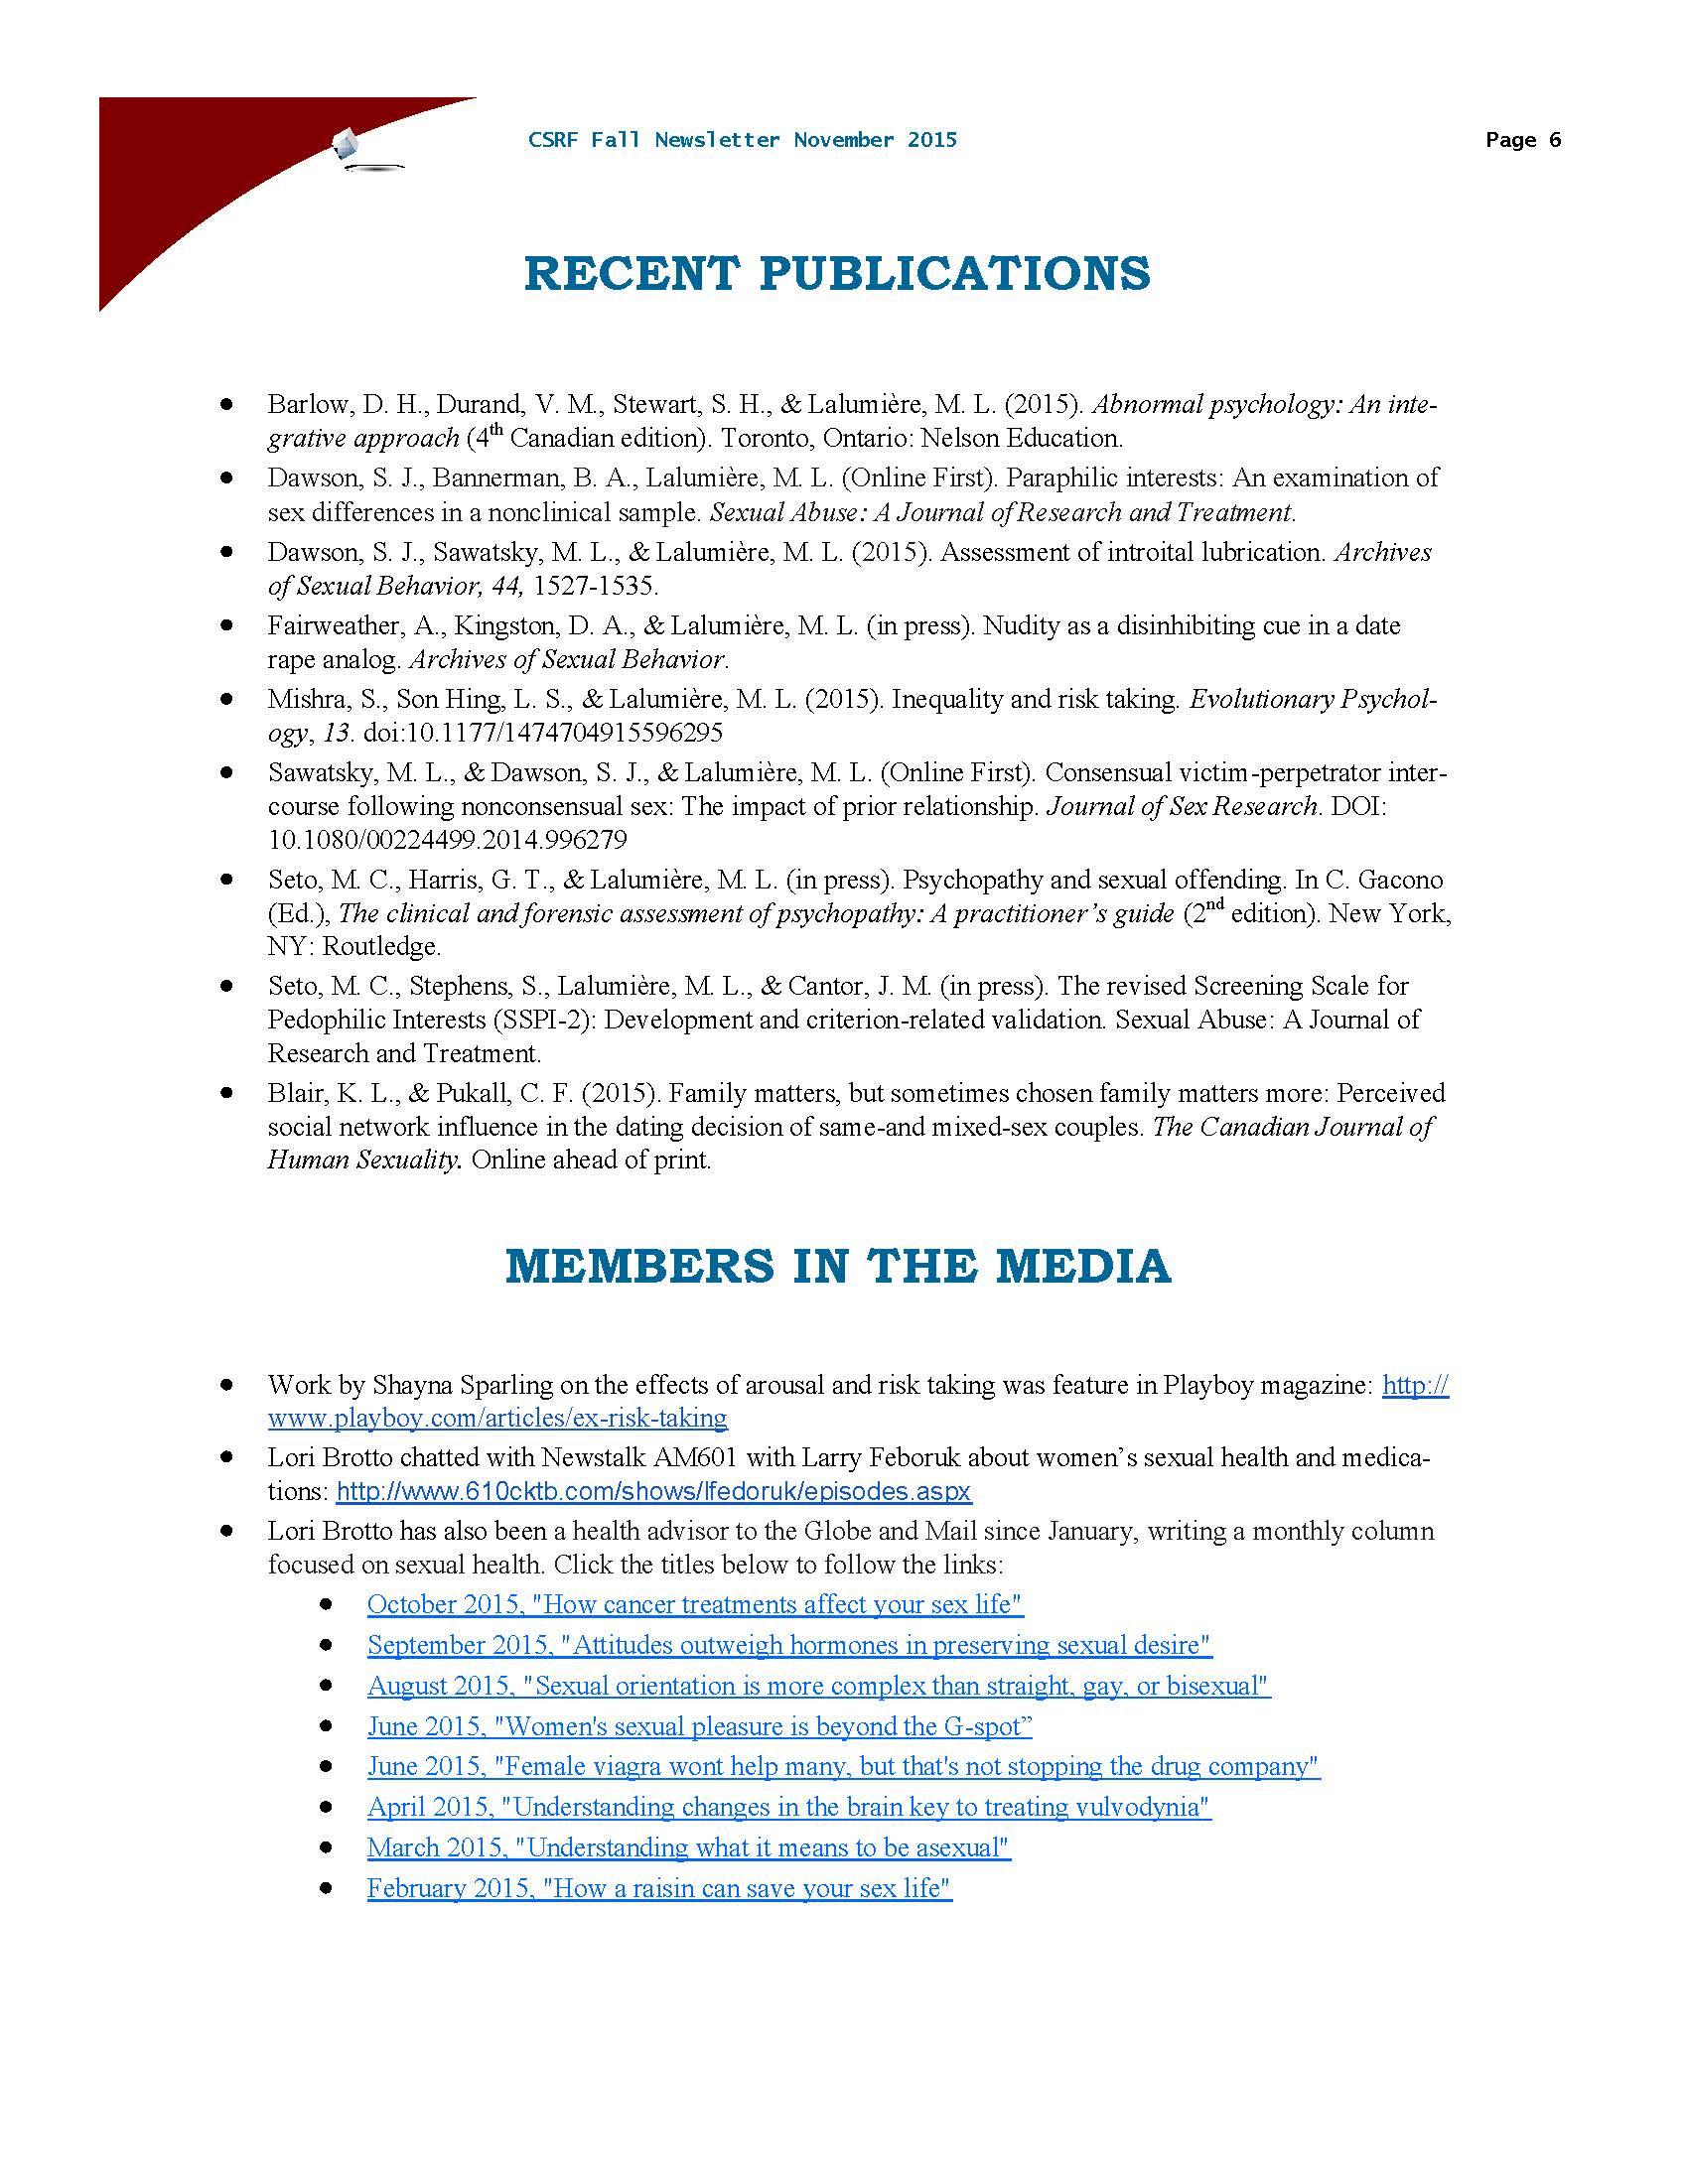 CSRF Fall Newsletter 2015_Page_06.jpg